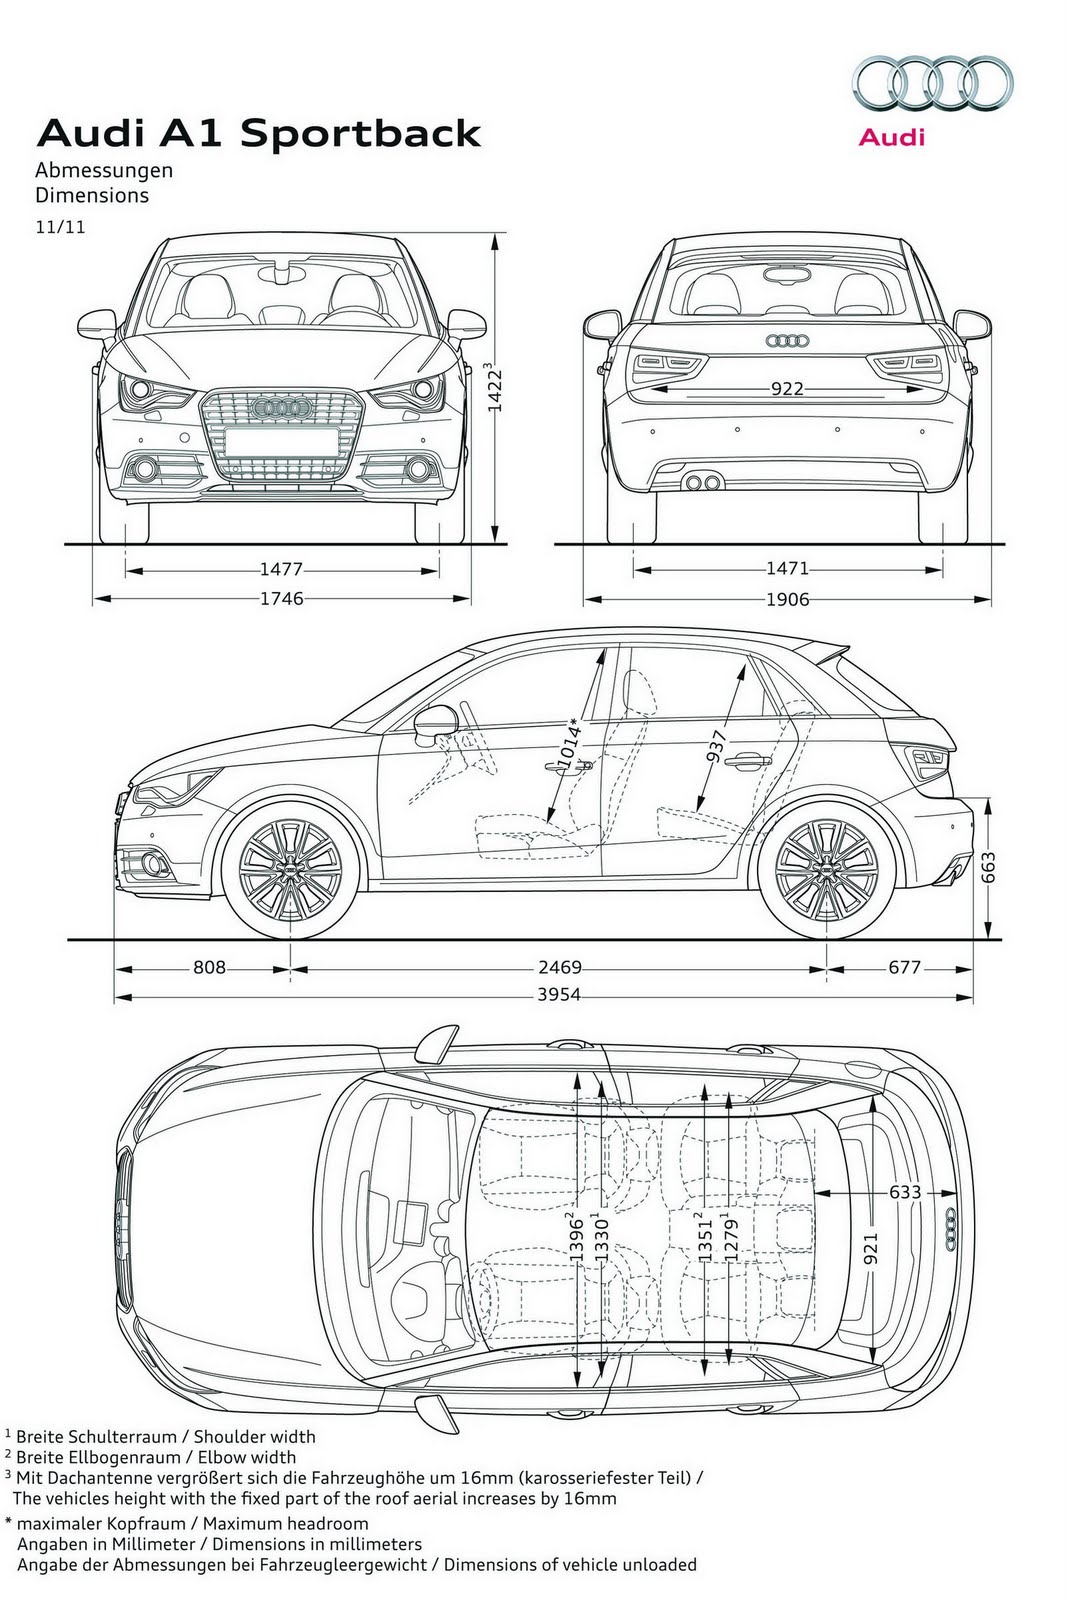 2012 Audi A1 Sportback Finalgearcom Forums 1 8 Engine Diagram Http Carscoopblogspotcom 2011 11 Birth Tohtml